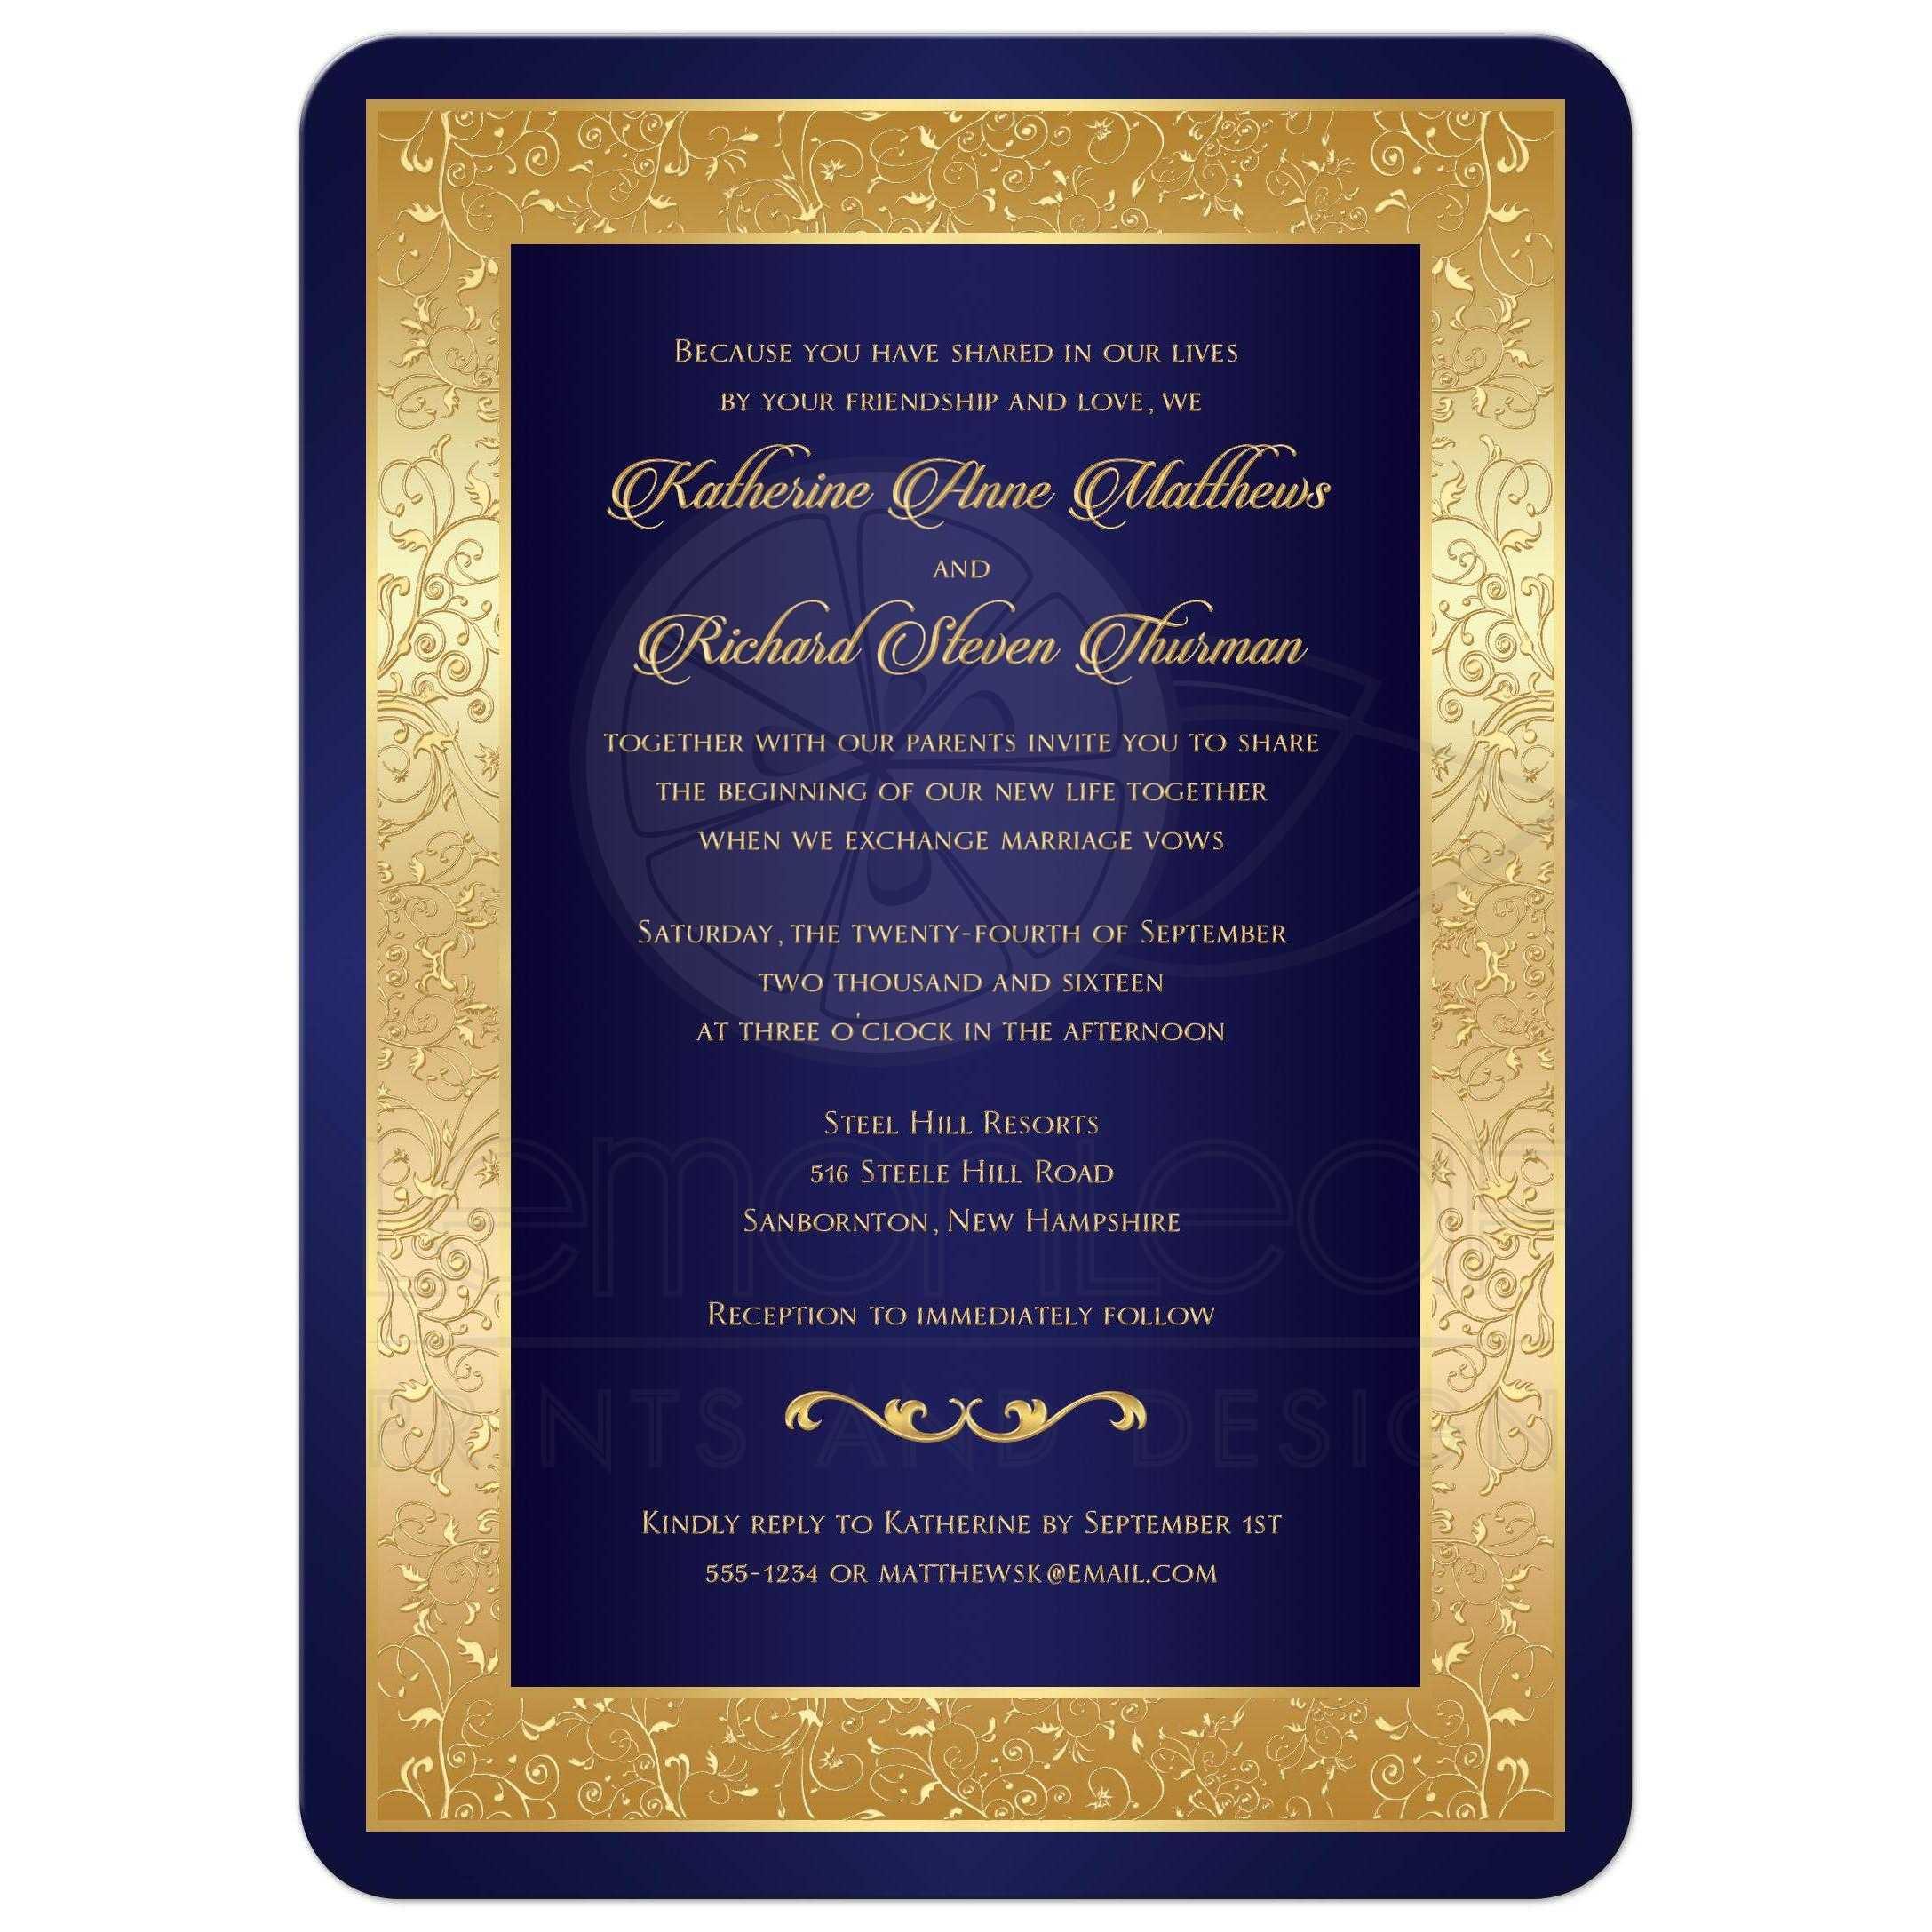 Gold And Blue Wedding Invitations: Ornate Scrolls, Vines